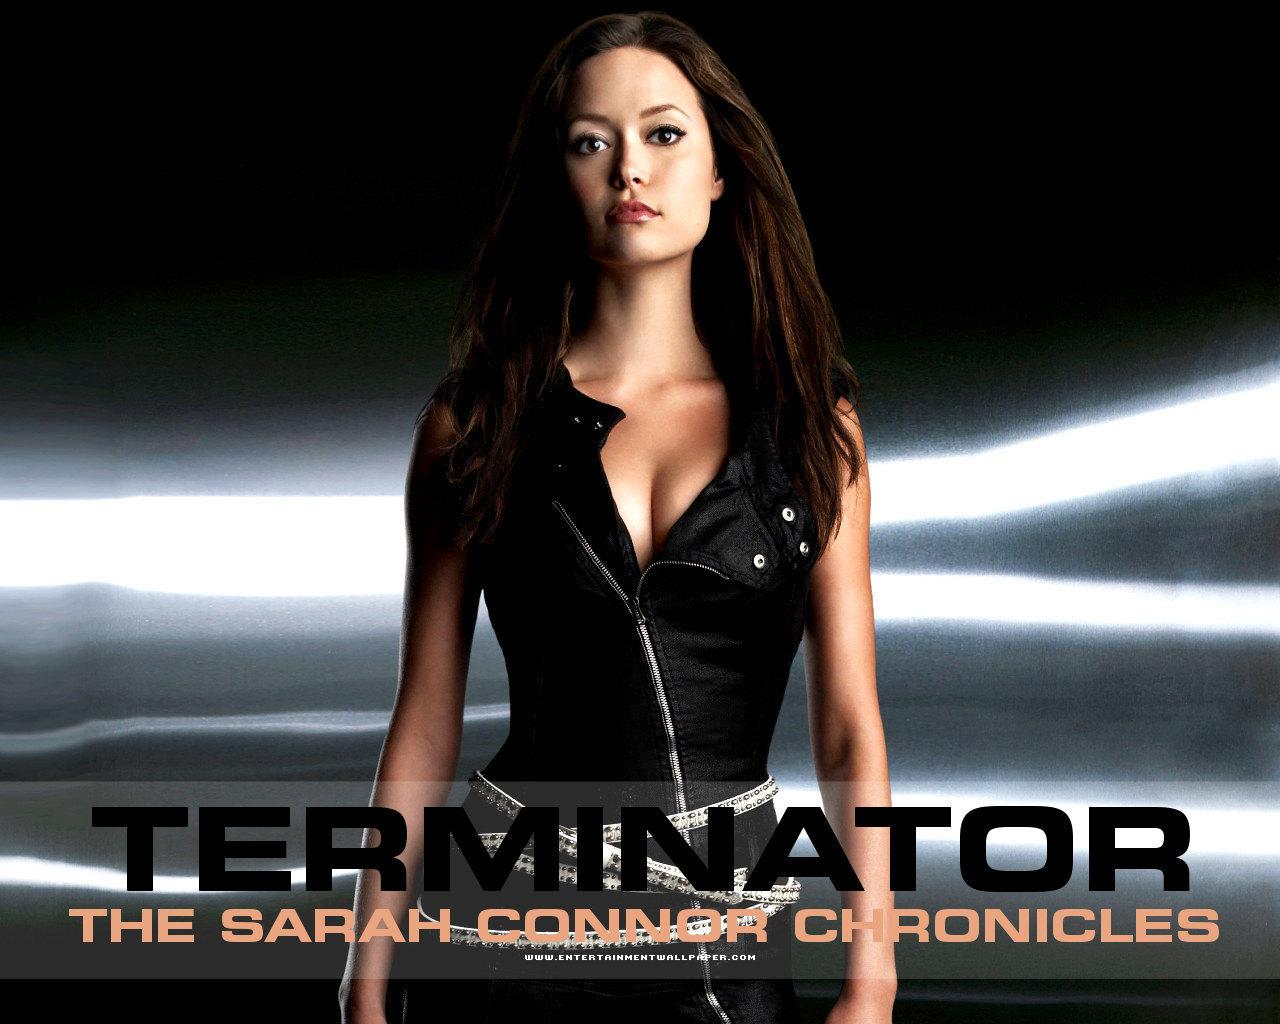 TSCC - The Sarah Connor Chronicles 1280x1024